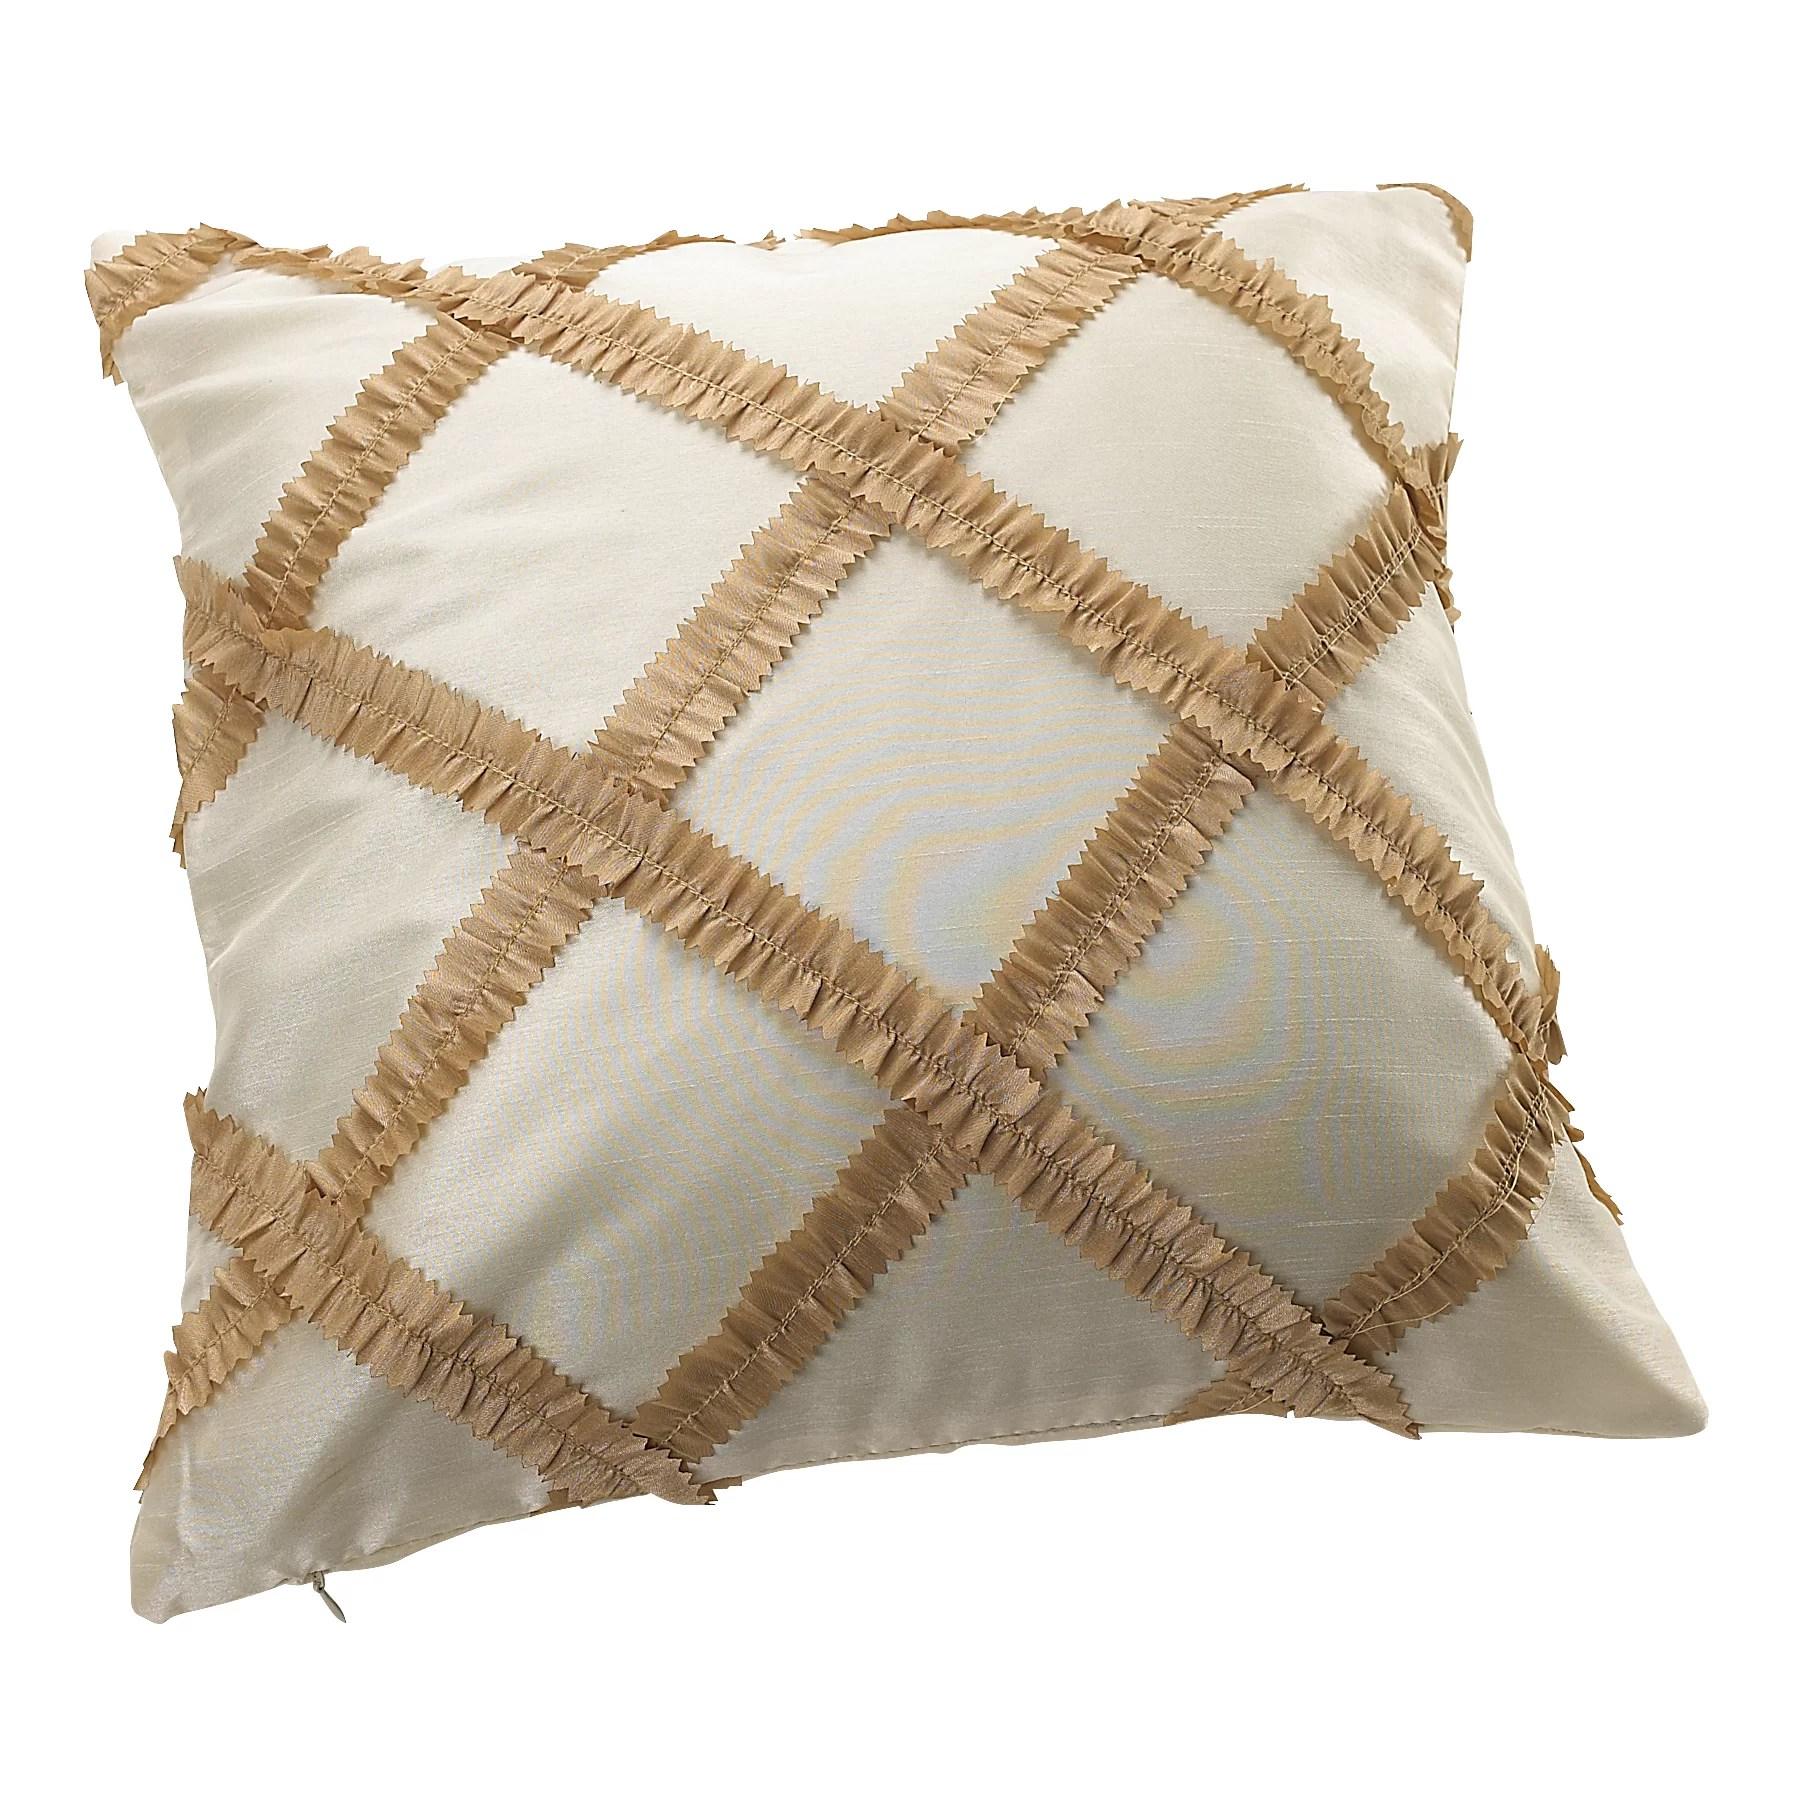 daenerys vintage embroidered diamond design decorative pillow cover